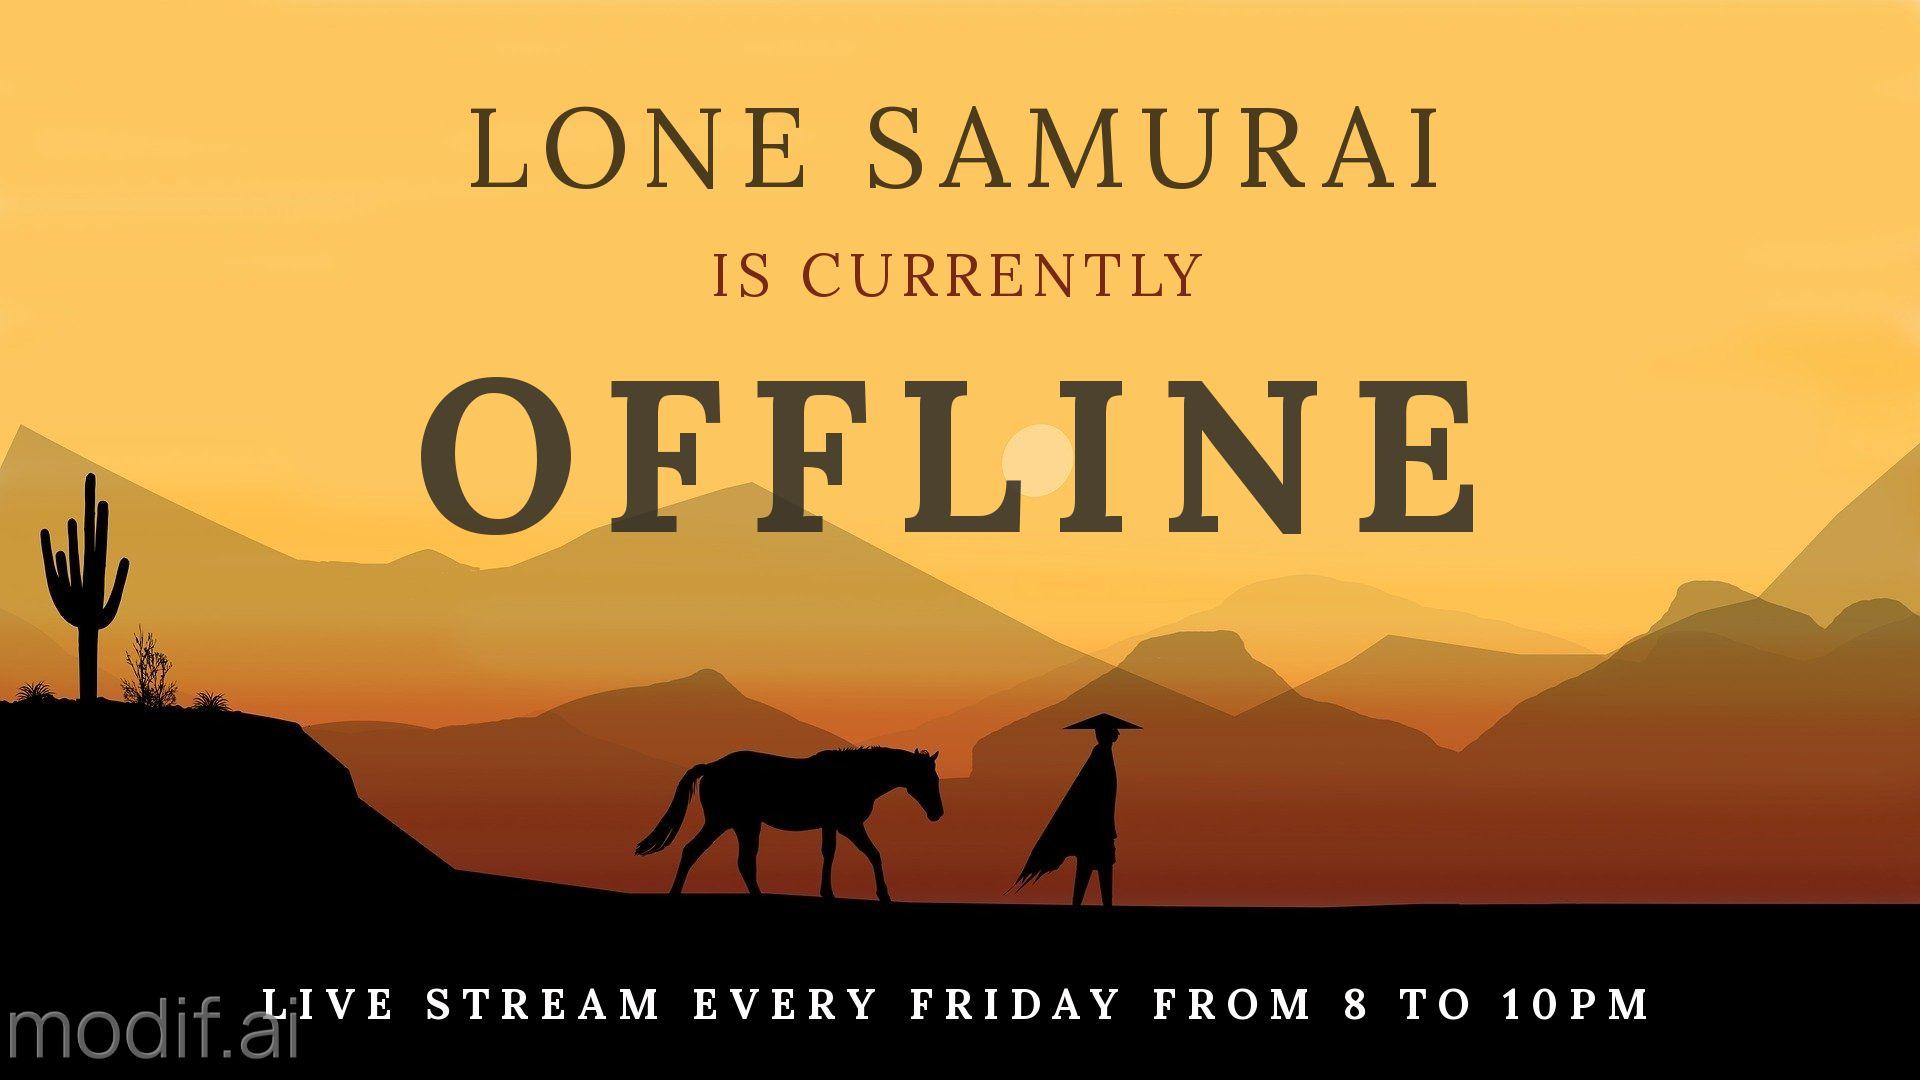 Samurai Twitch Offline Banner Template